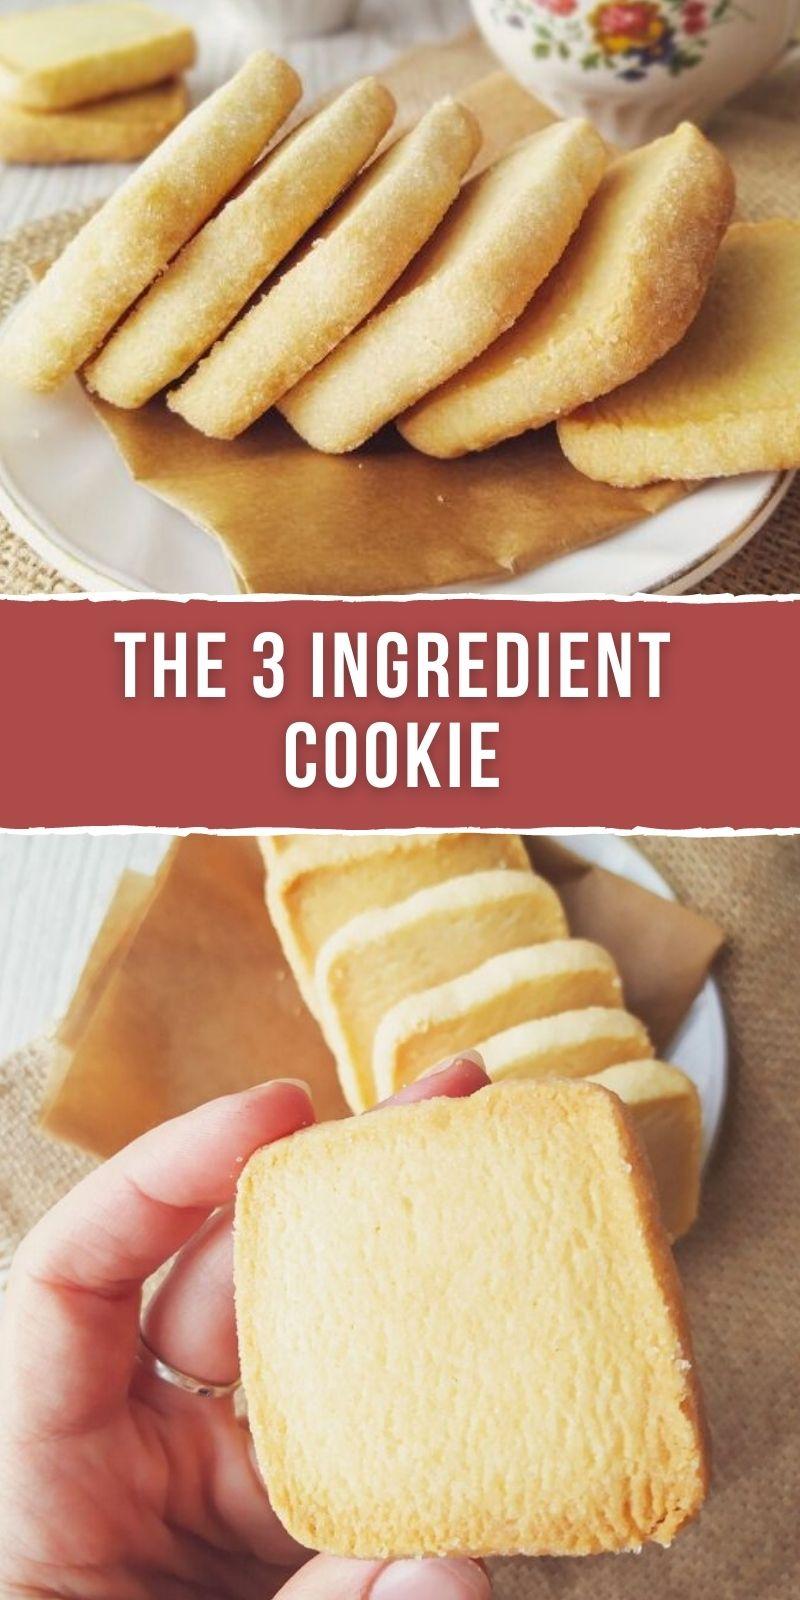 THE 3 INGREDIENT COOKIE